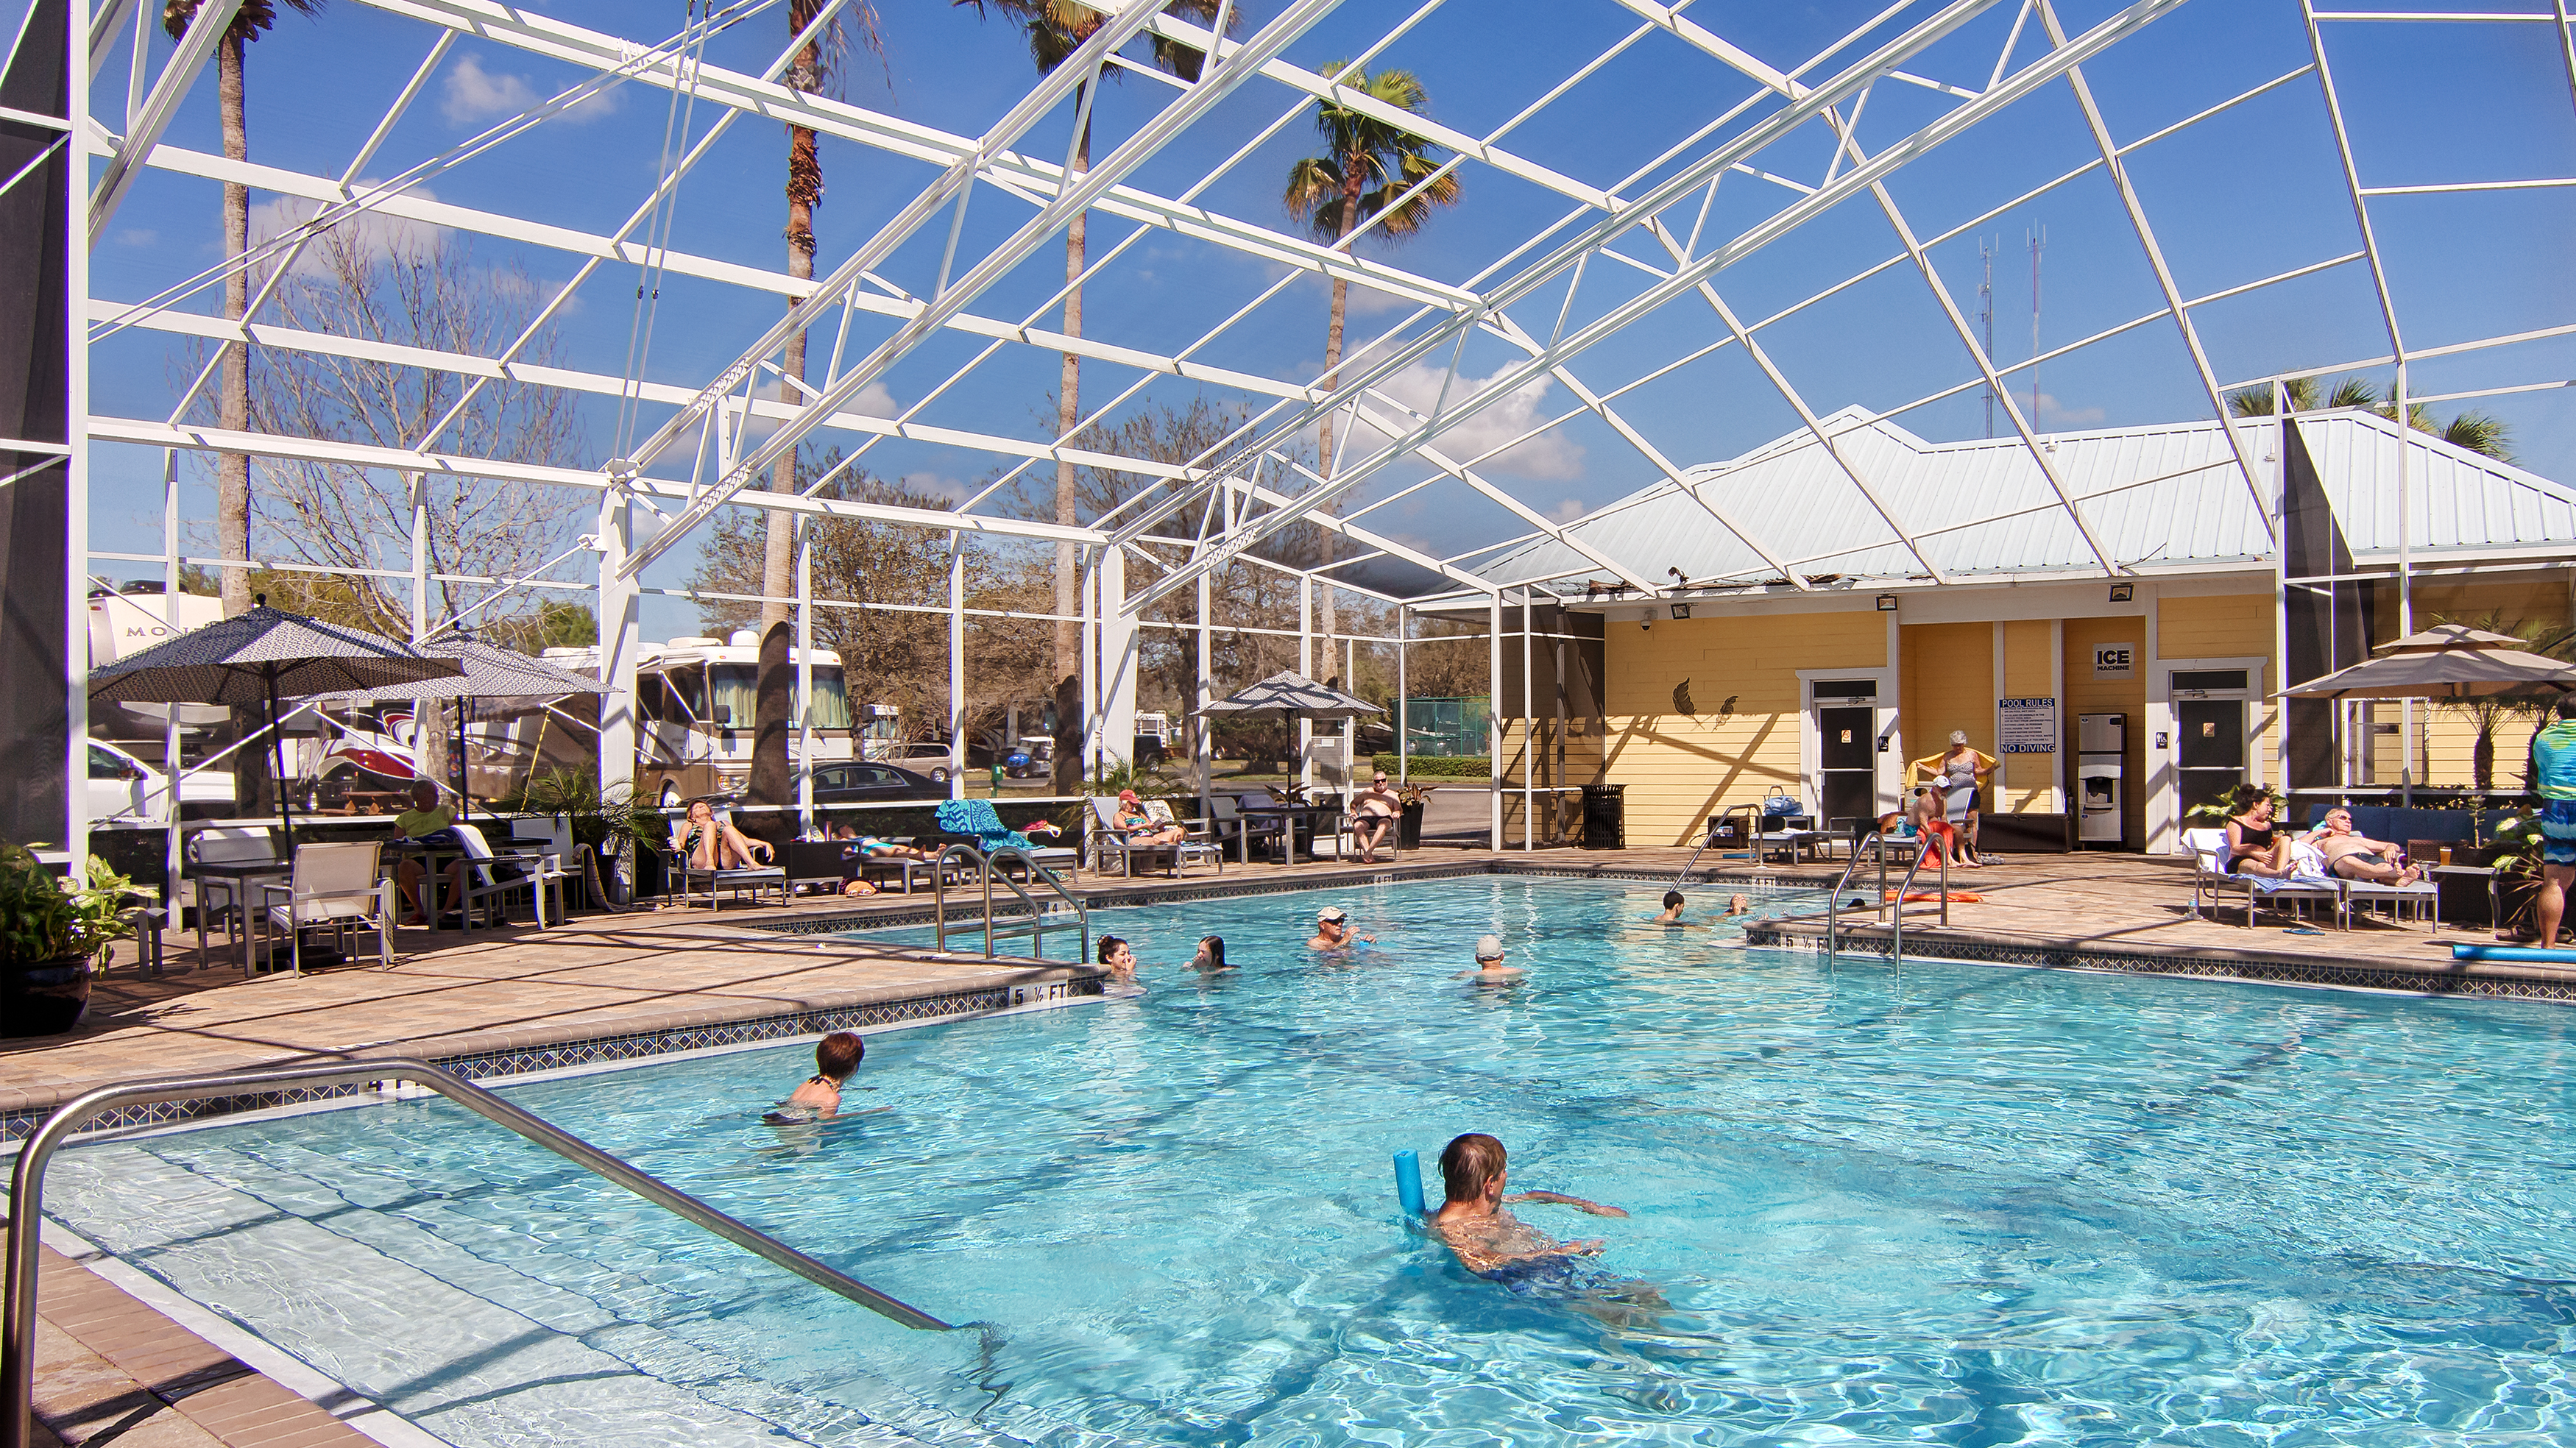 Lazydays RV Resort Tampa Photo Gallery